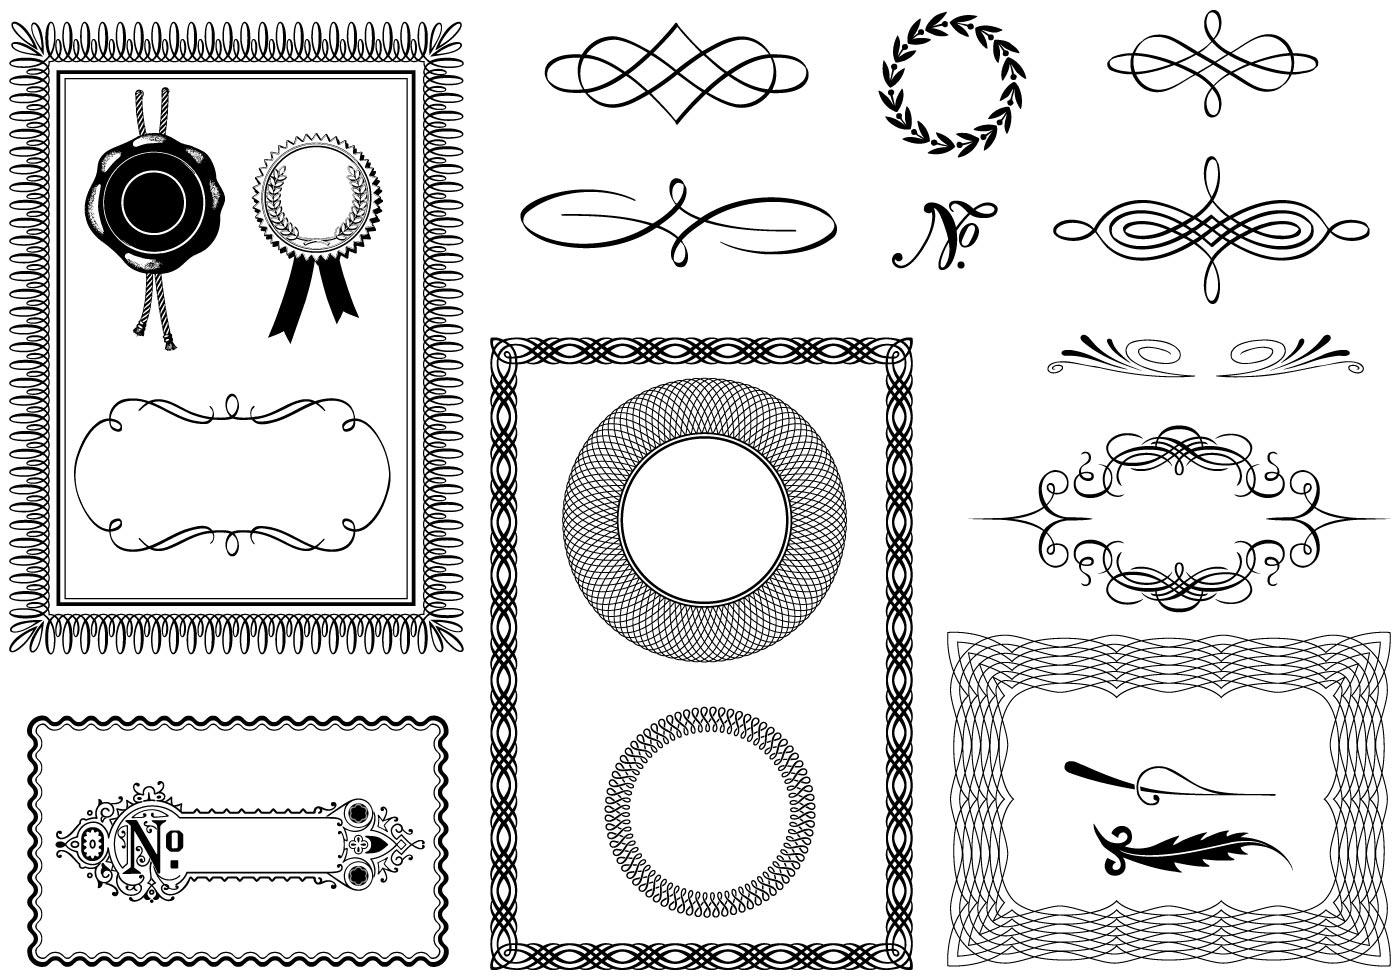 Certificate Vector Elements Pack - Kostenlose Vektor-Kunst, Archiv ...